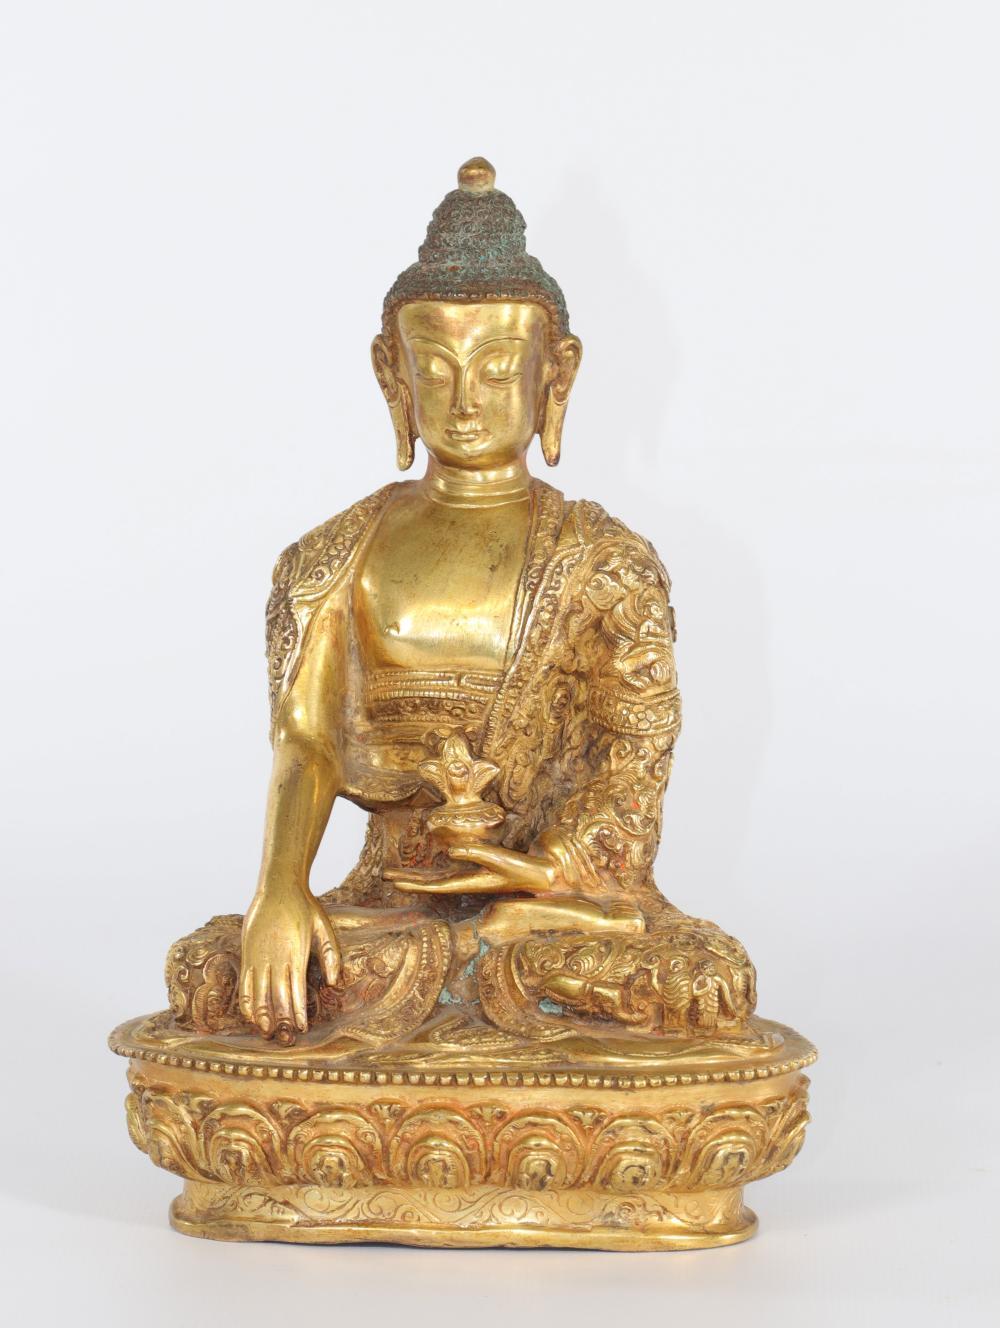 China Tibet Buddha in gilded bronze Sizes: H=200mm L=140mm Weight (K): 1,62kg Conditi